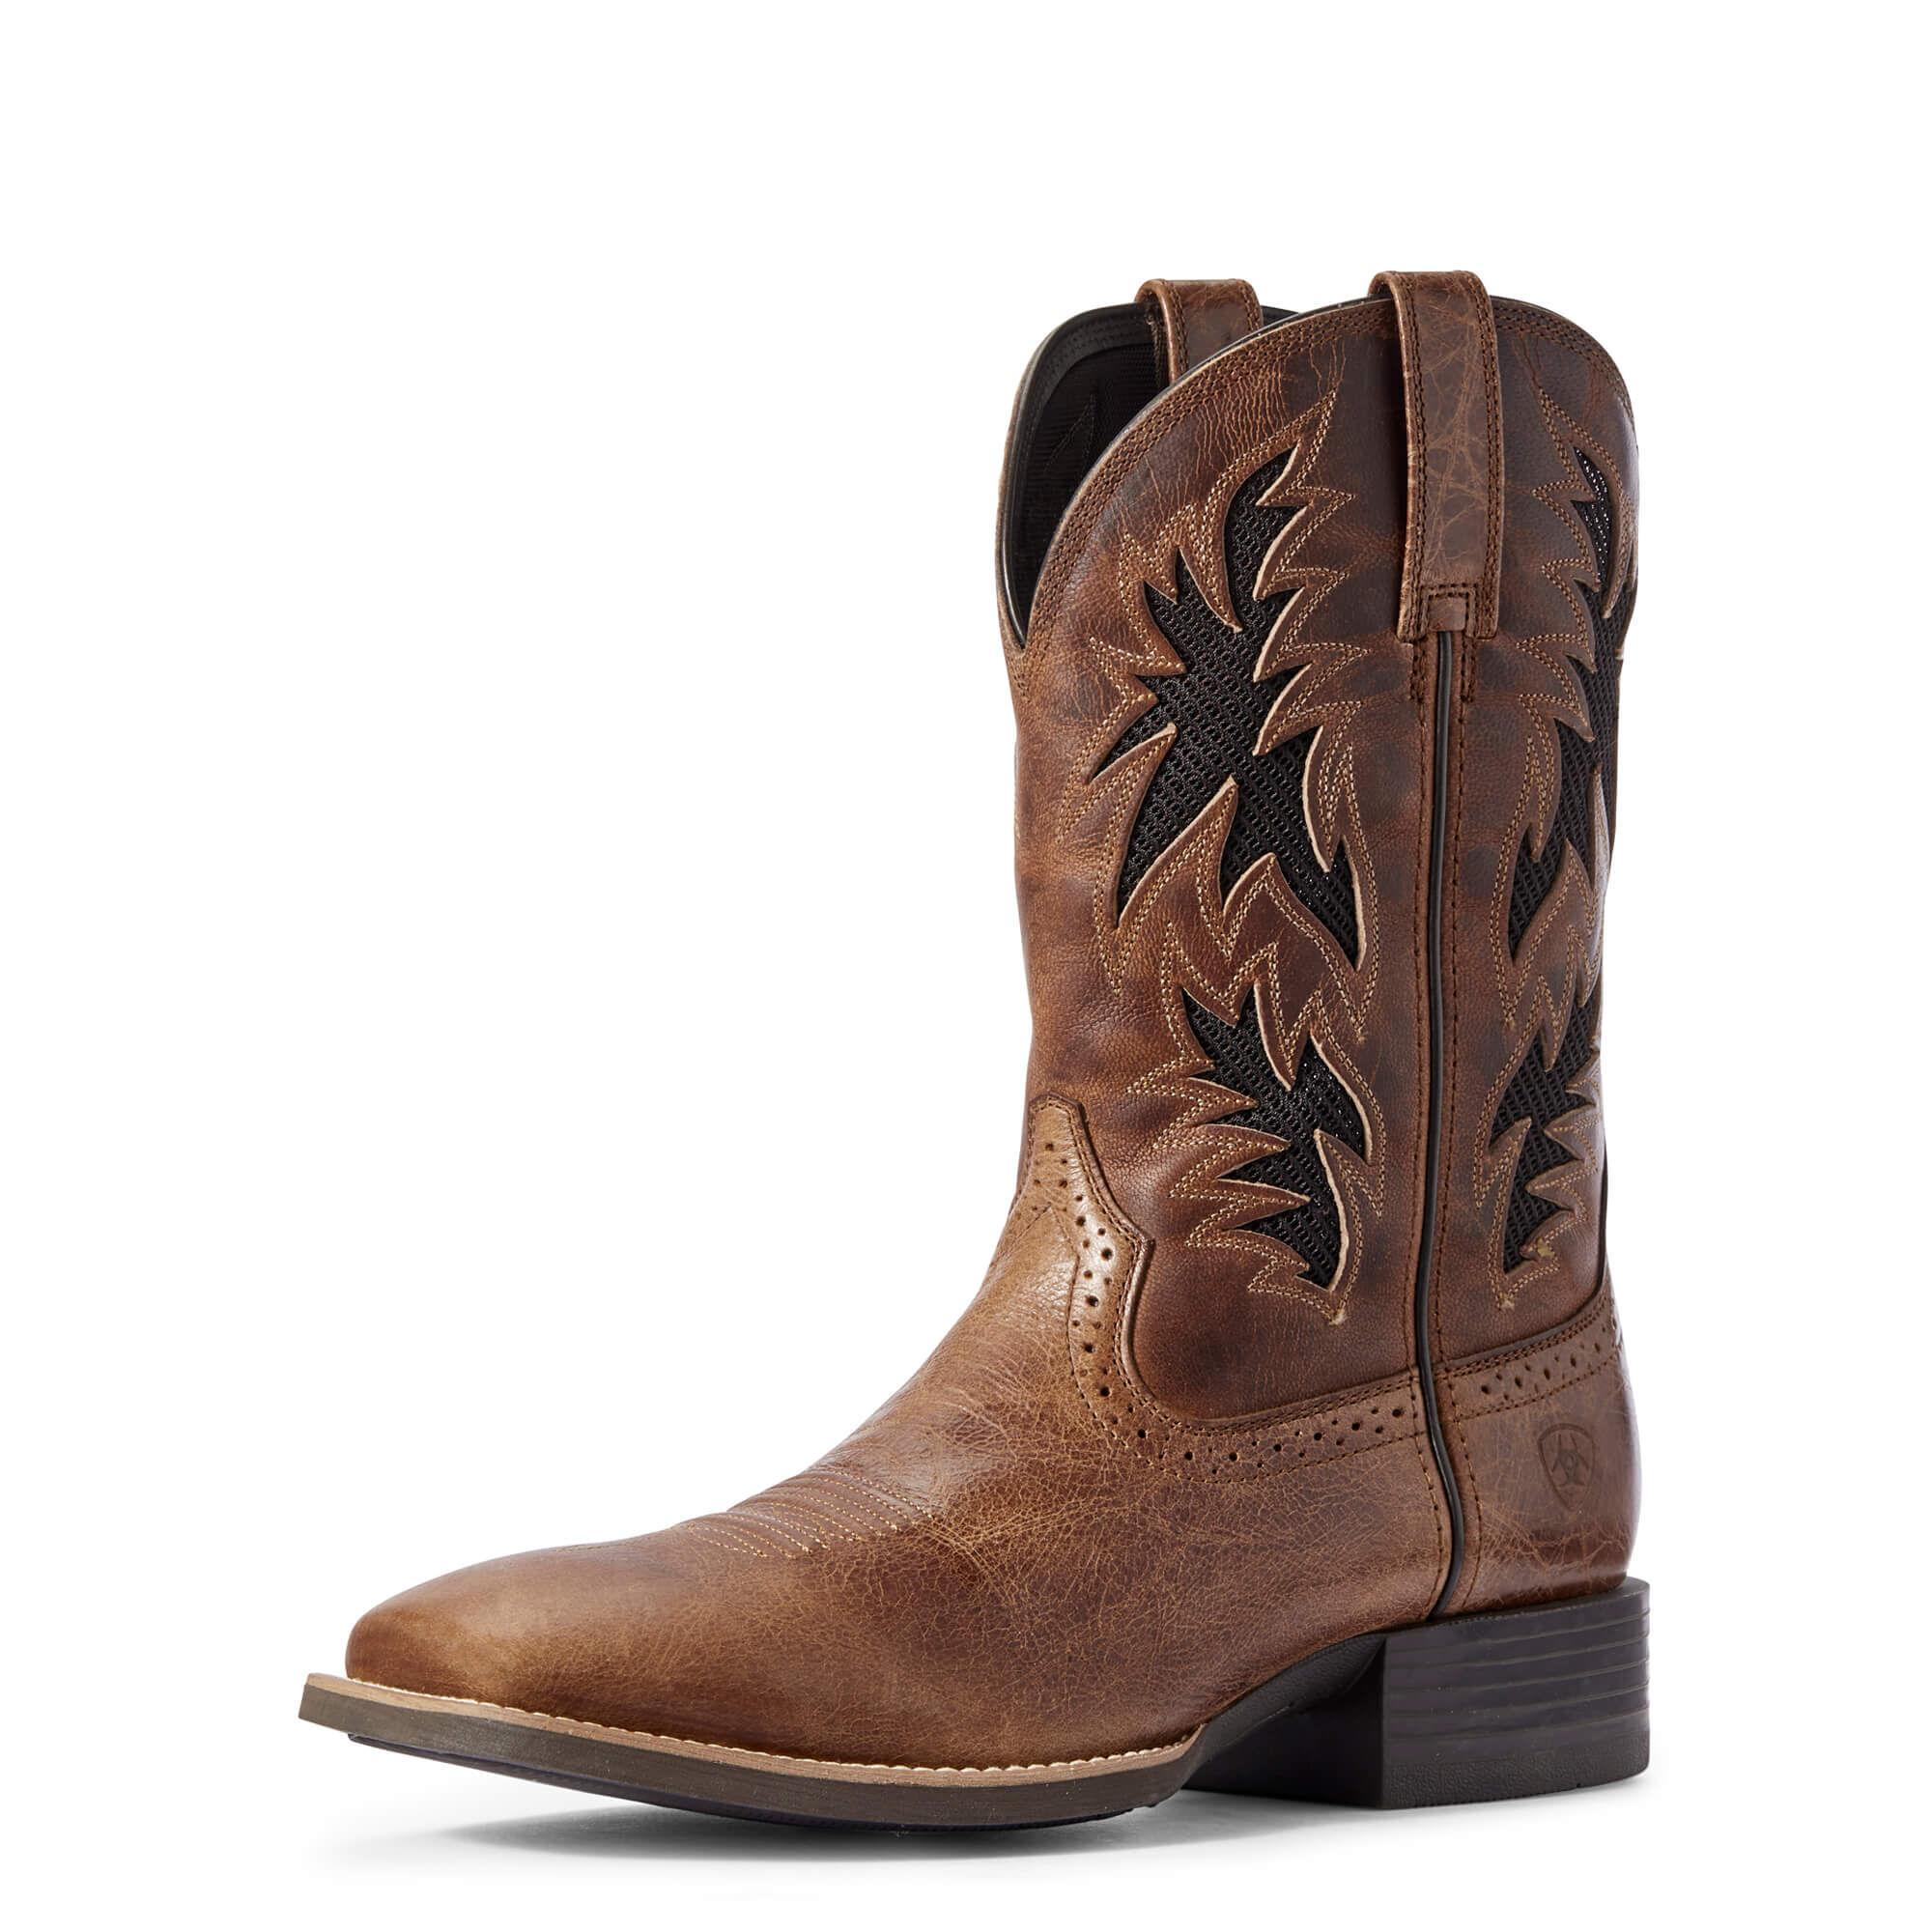 Ariat Men's Sport Cool VentTEK Western Boots in Dark Tan Leather, Size 9 EE / Wide by Ariat